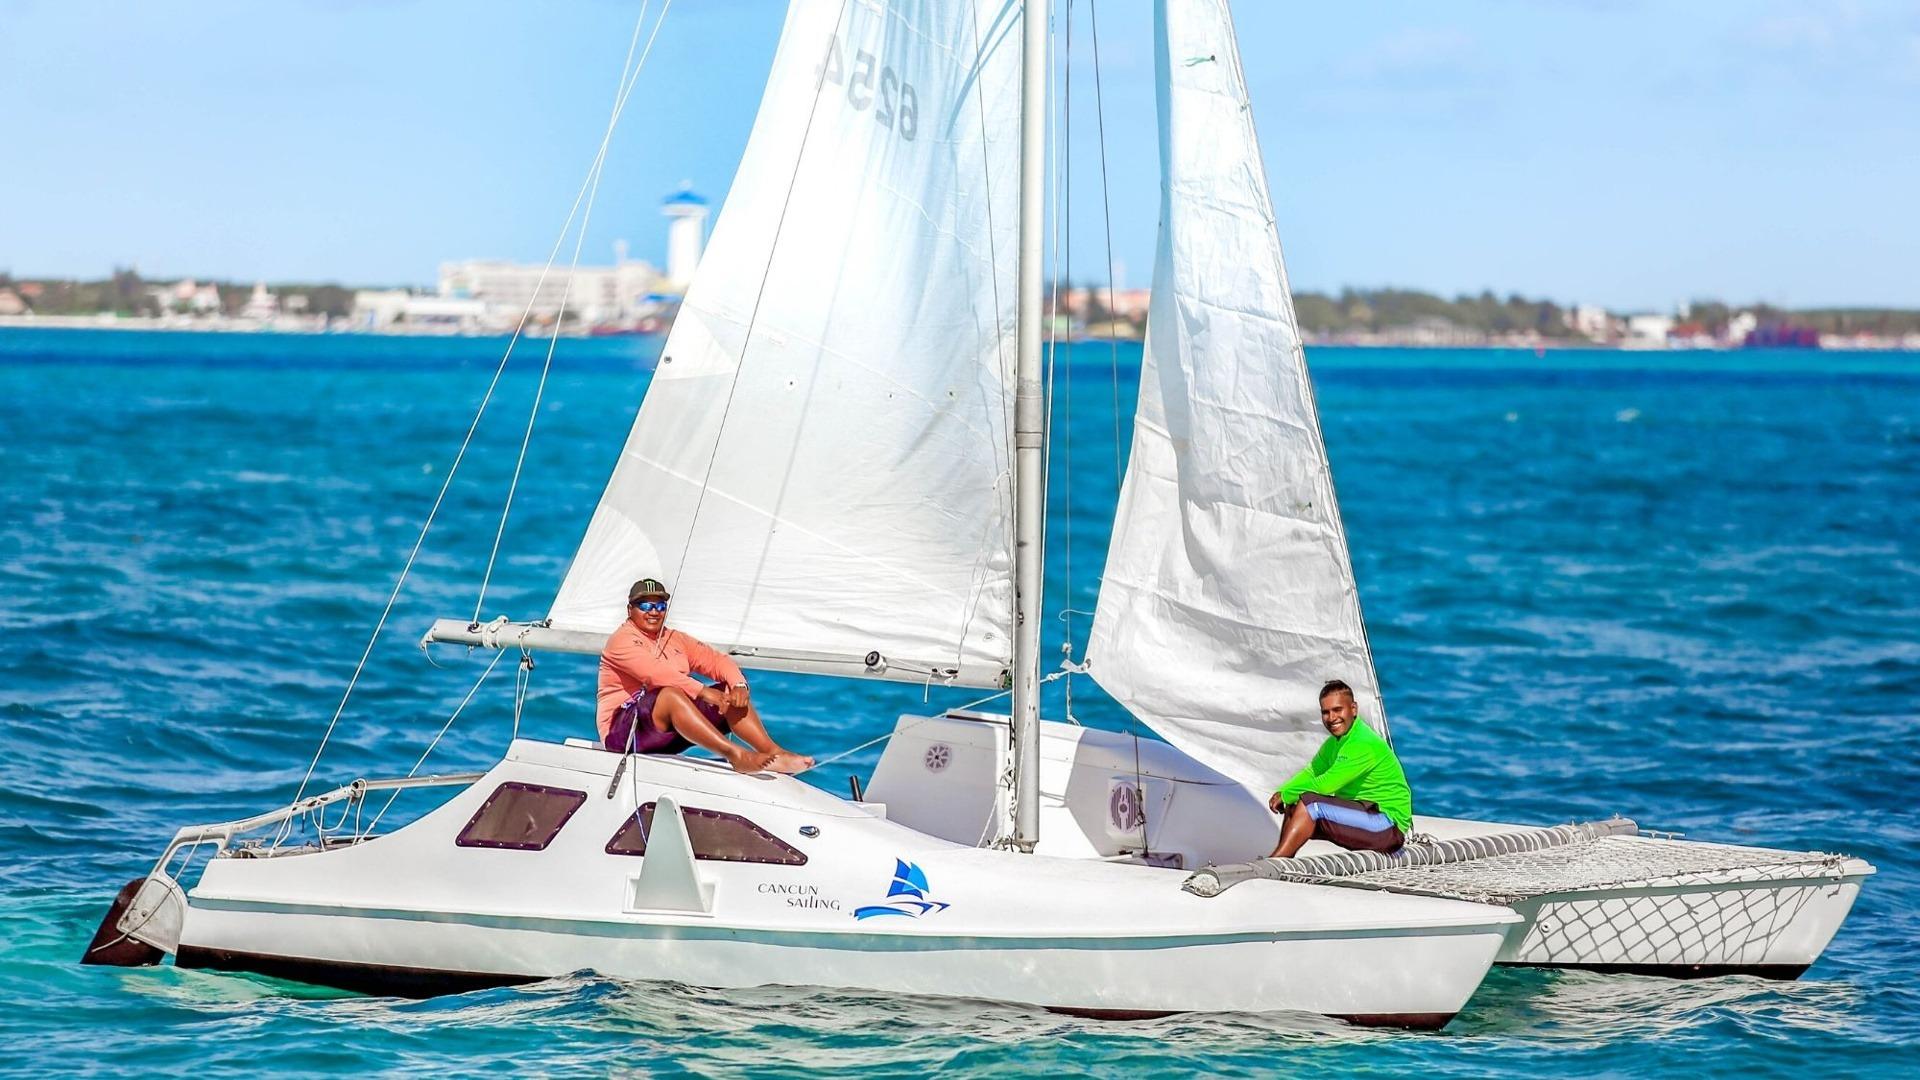 1 - LowRes - Private Isla Mujeres tour in catamaran - Seawind - Cancun Sailing